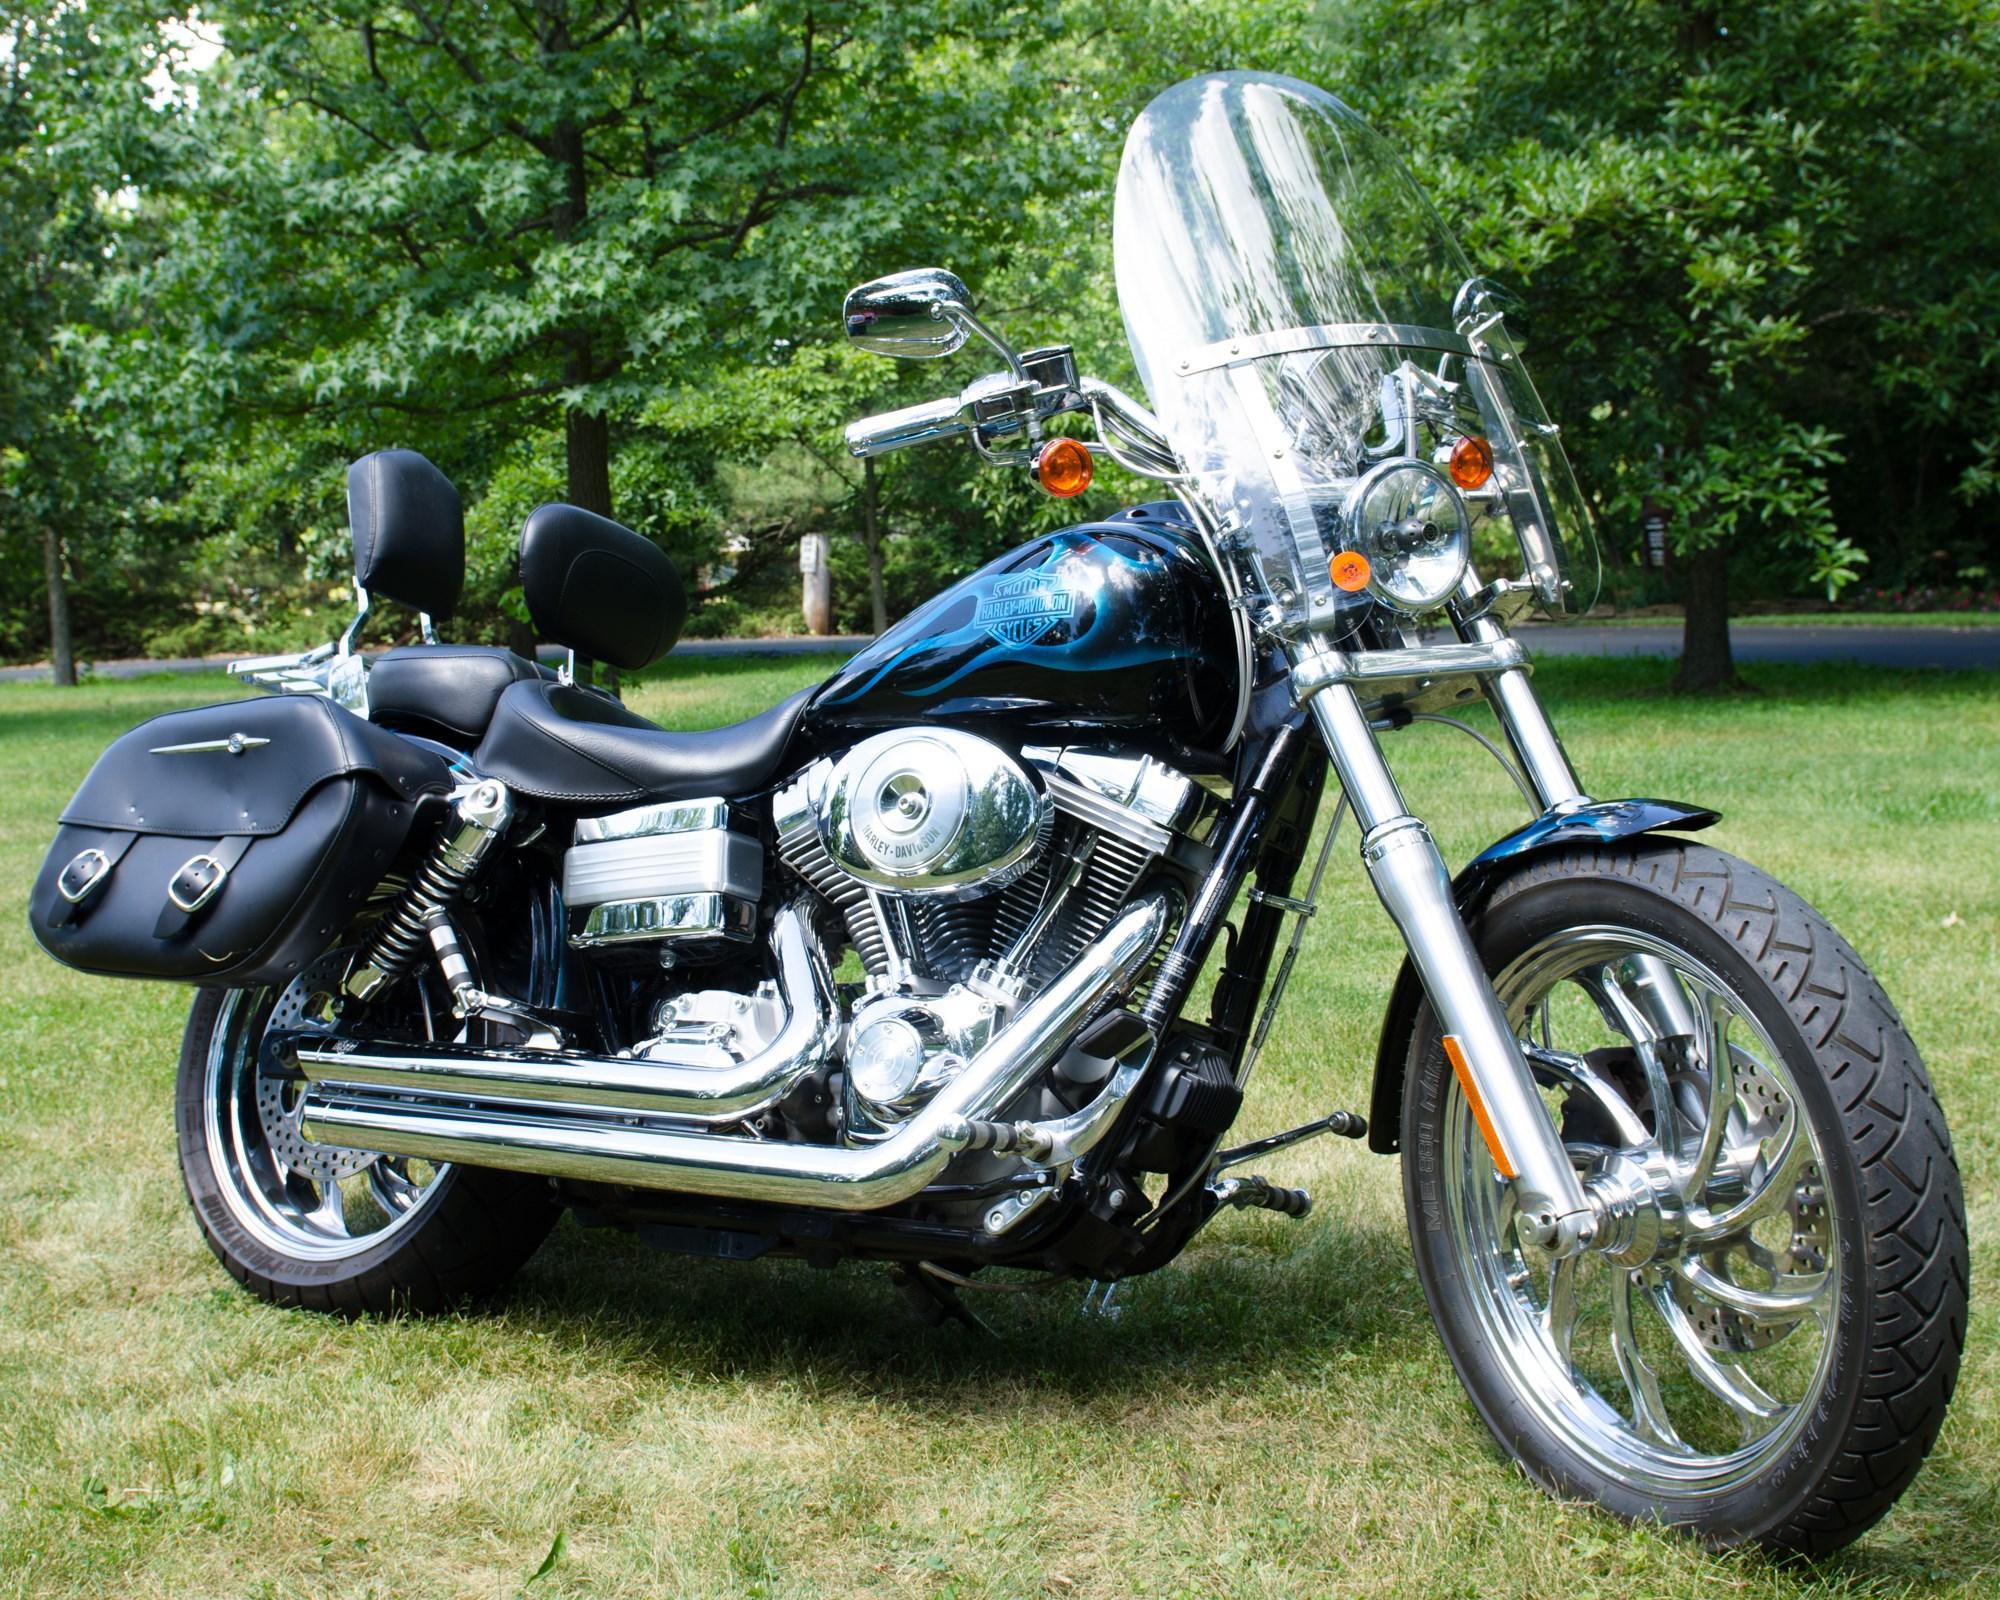 2006 HarleyDavidson FXDCI Dyna Super Glide Custom